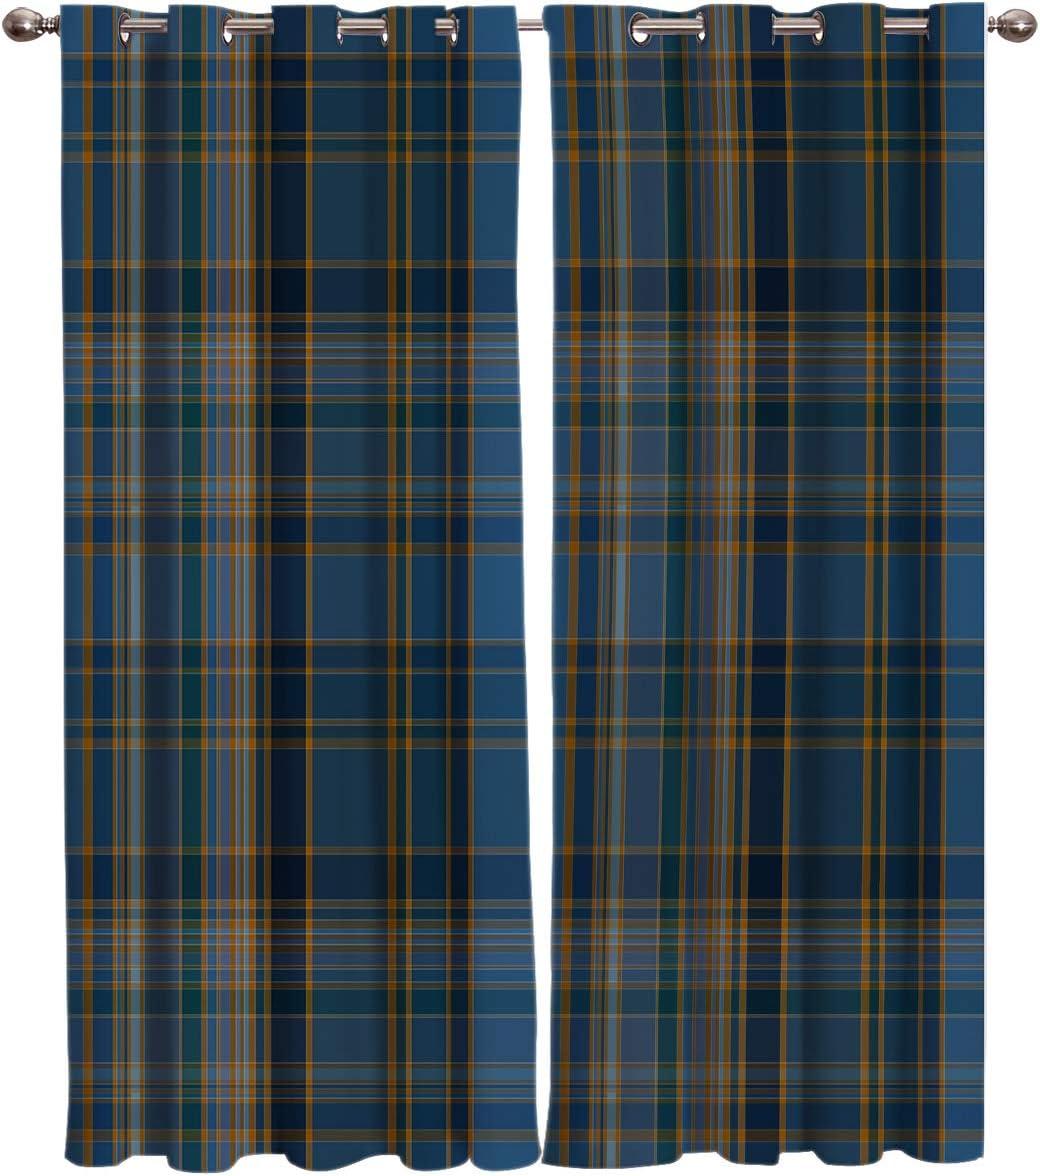 T&H Home Curtain Panel for Bedroom/Patio Door - Plaid Curtains, Classic Tartan Plaid Cells Stripes Geometric Pattern Window Treatment Set for Sliding Door, Look Semi Drapes - 104